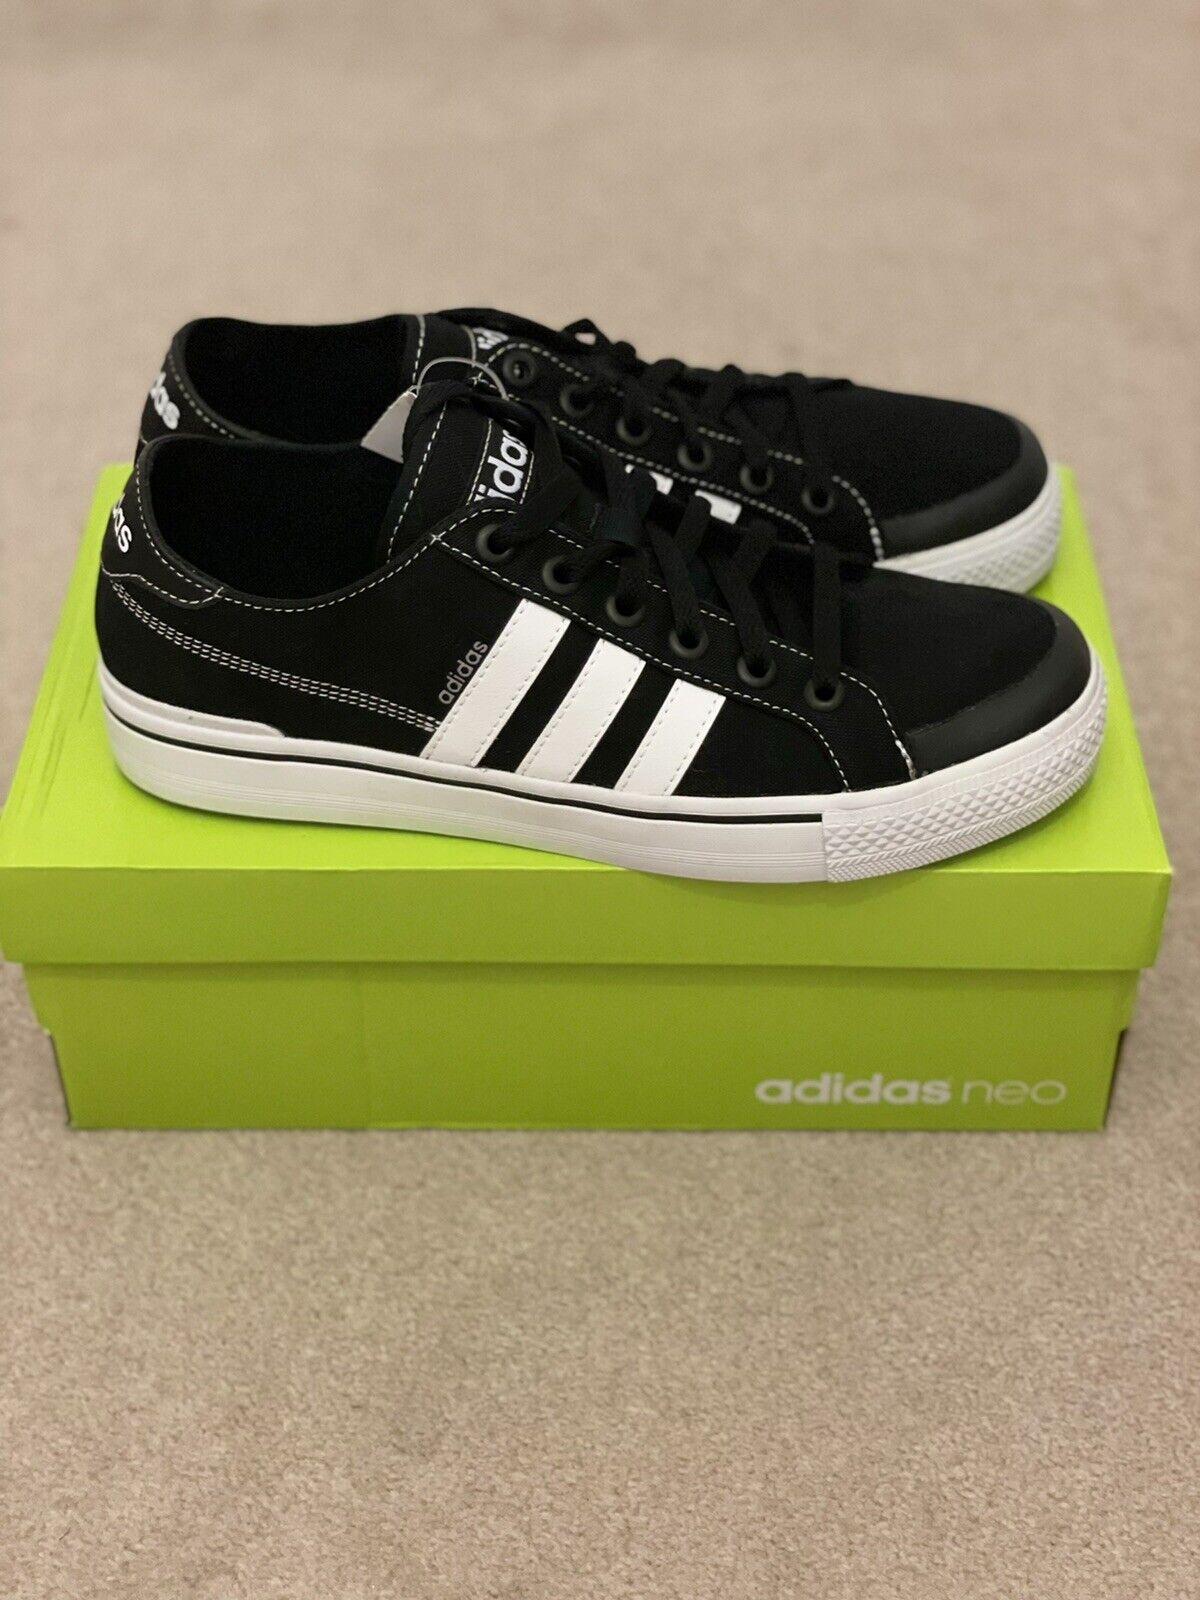 Men's Adidas Clemente - UK 8.5